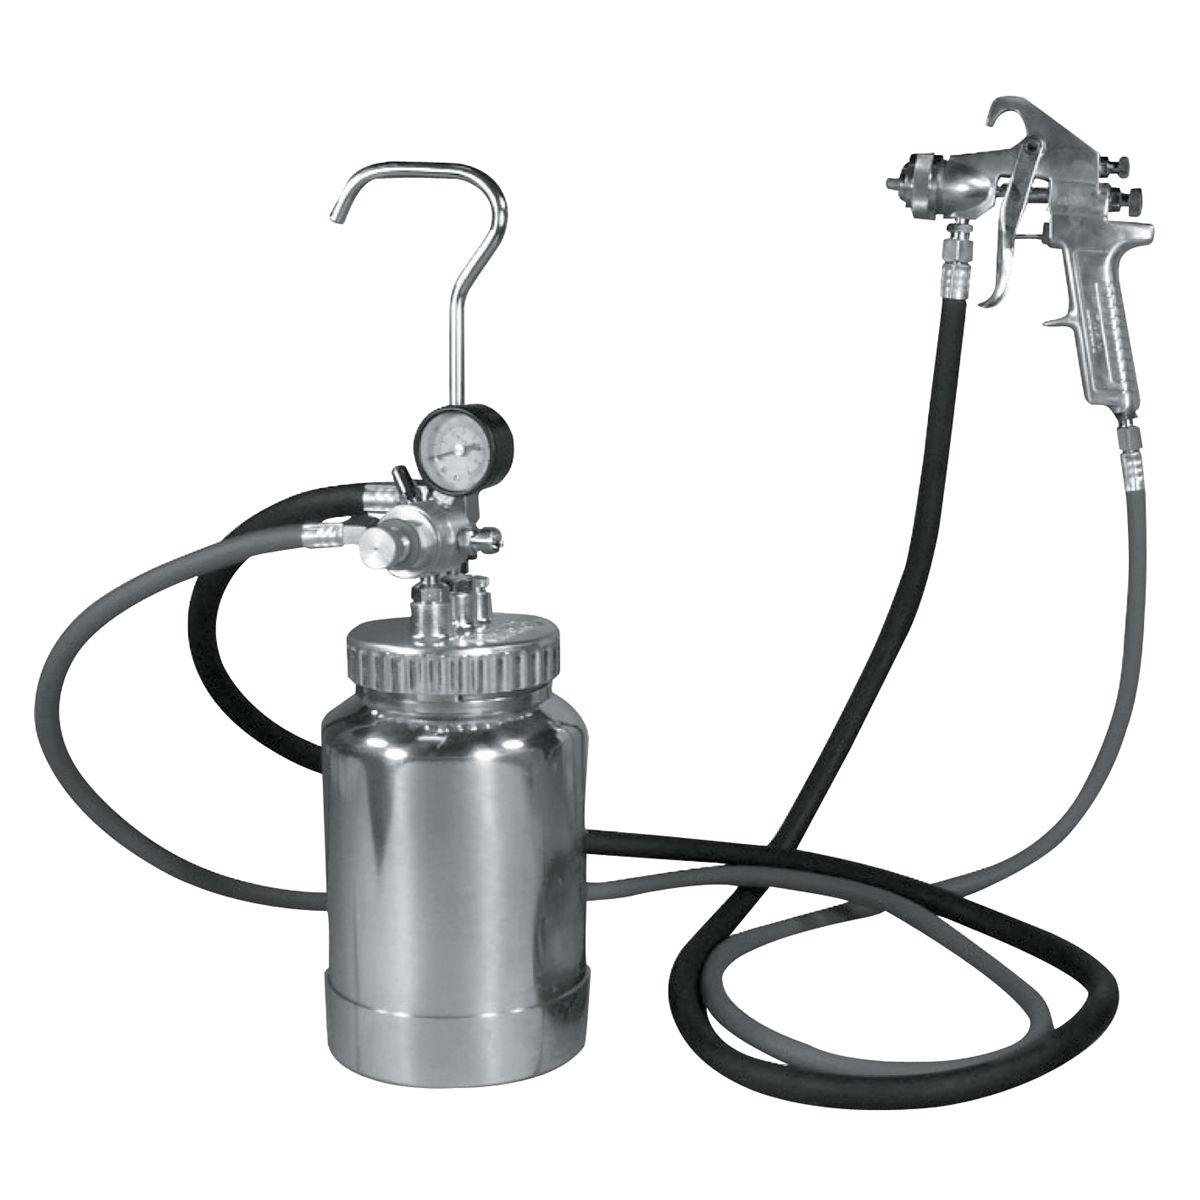 Pressure Paint Gun Pot : Quart pressure pot w silver gun and hose